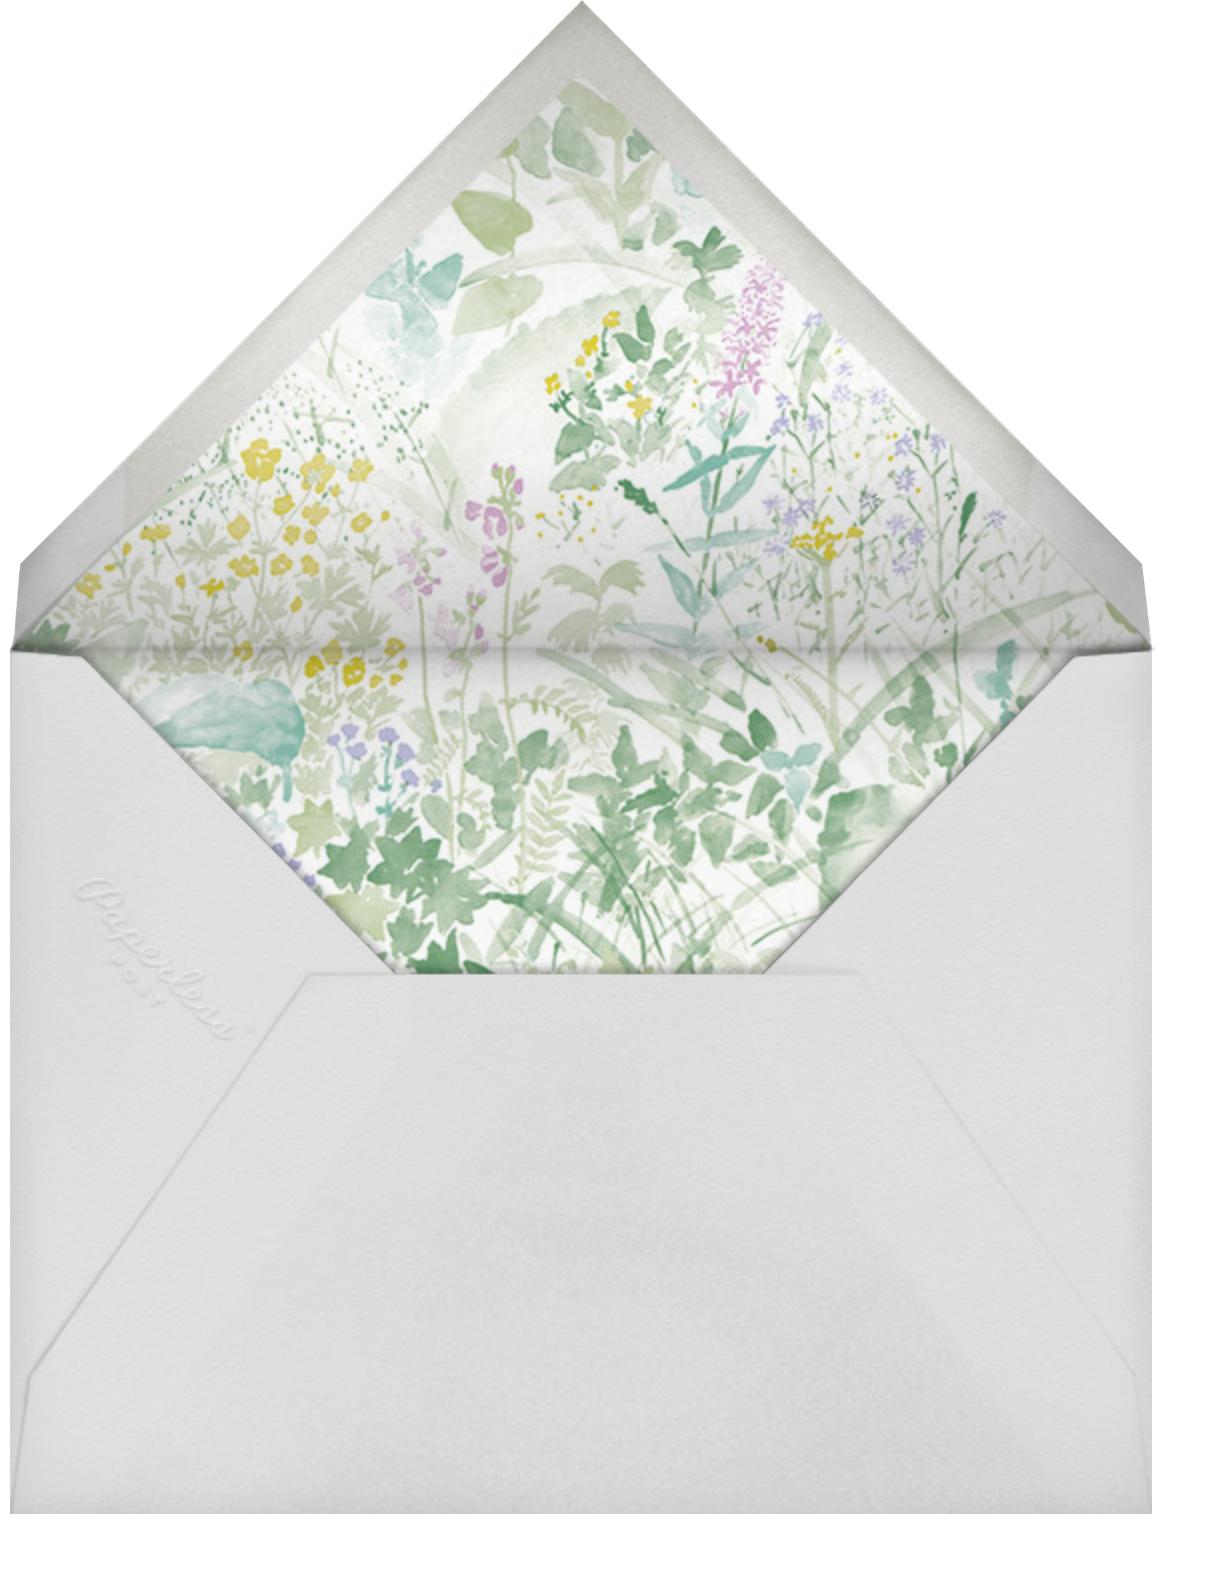 Kesanto (Square) - Marimekko - Mother's Day - envelope back